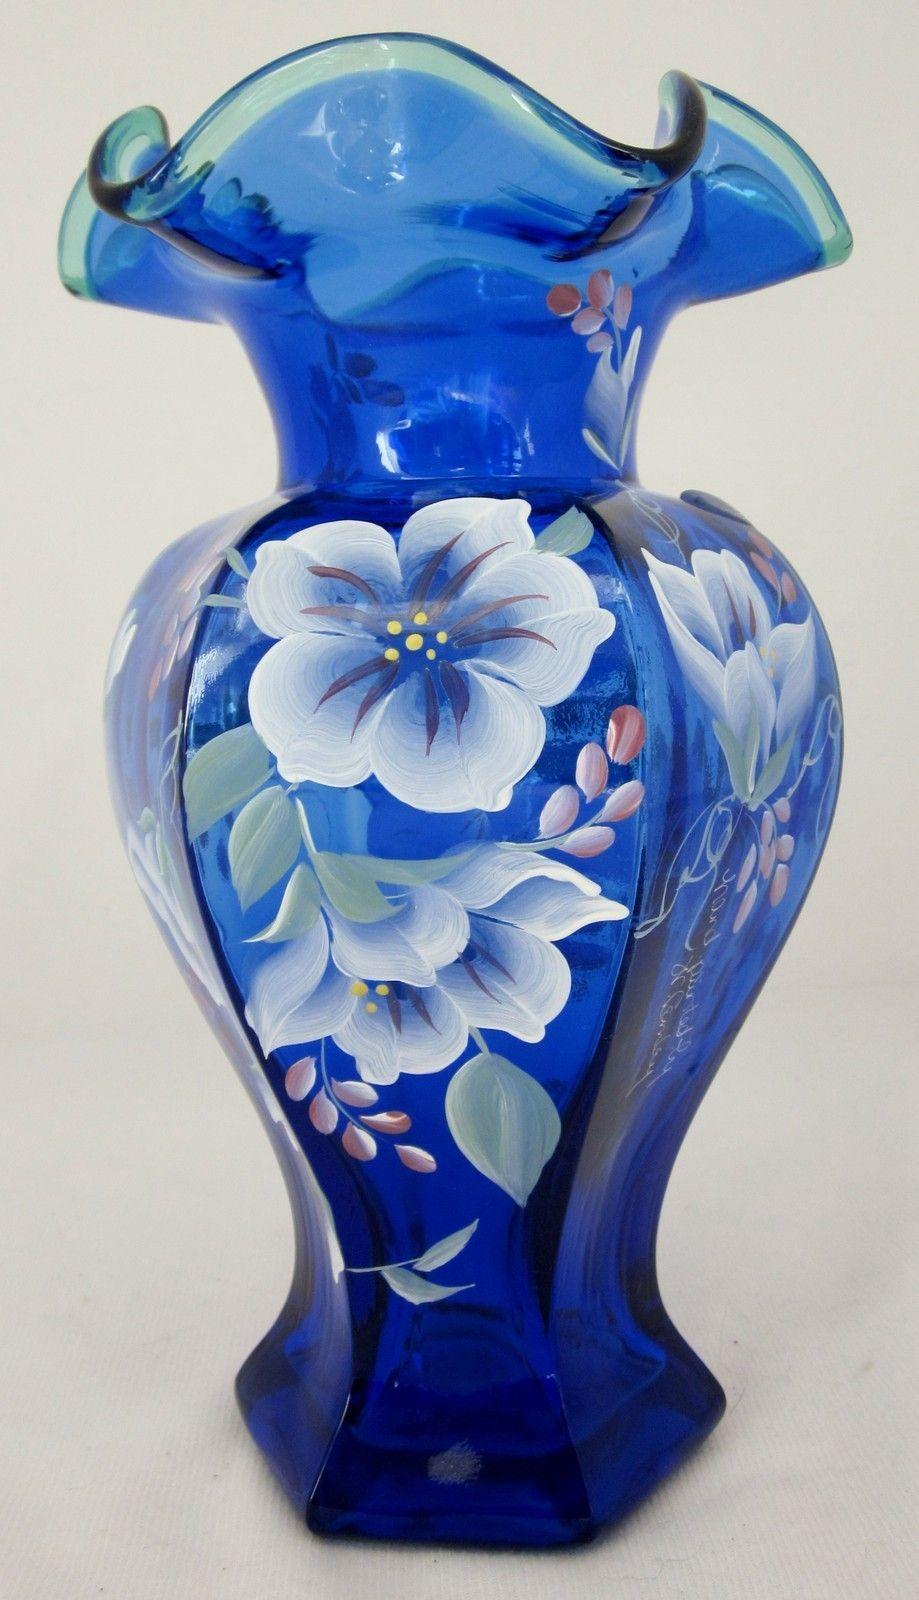 Fenton cobalt blue vase hand painted signed 75th anniversary fenton cobalt blue vase hand painted signed 75th anniversary hexagone shaped ebay reviewsmspy